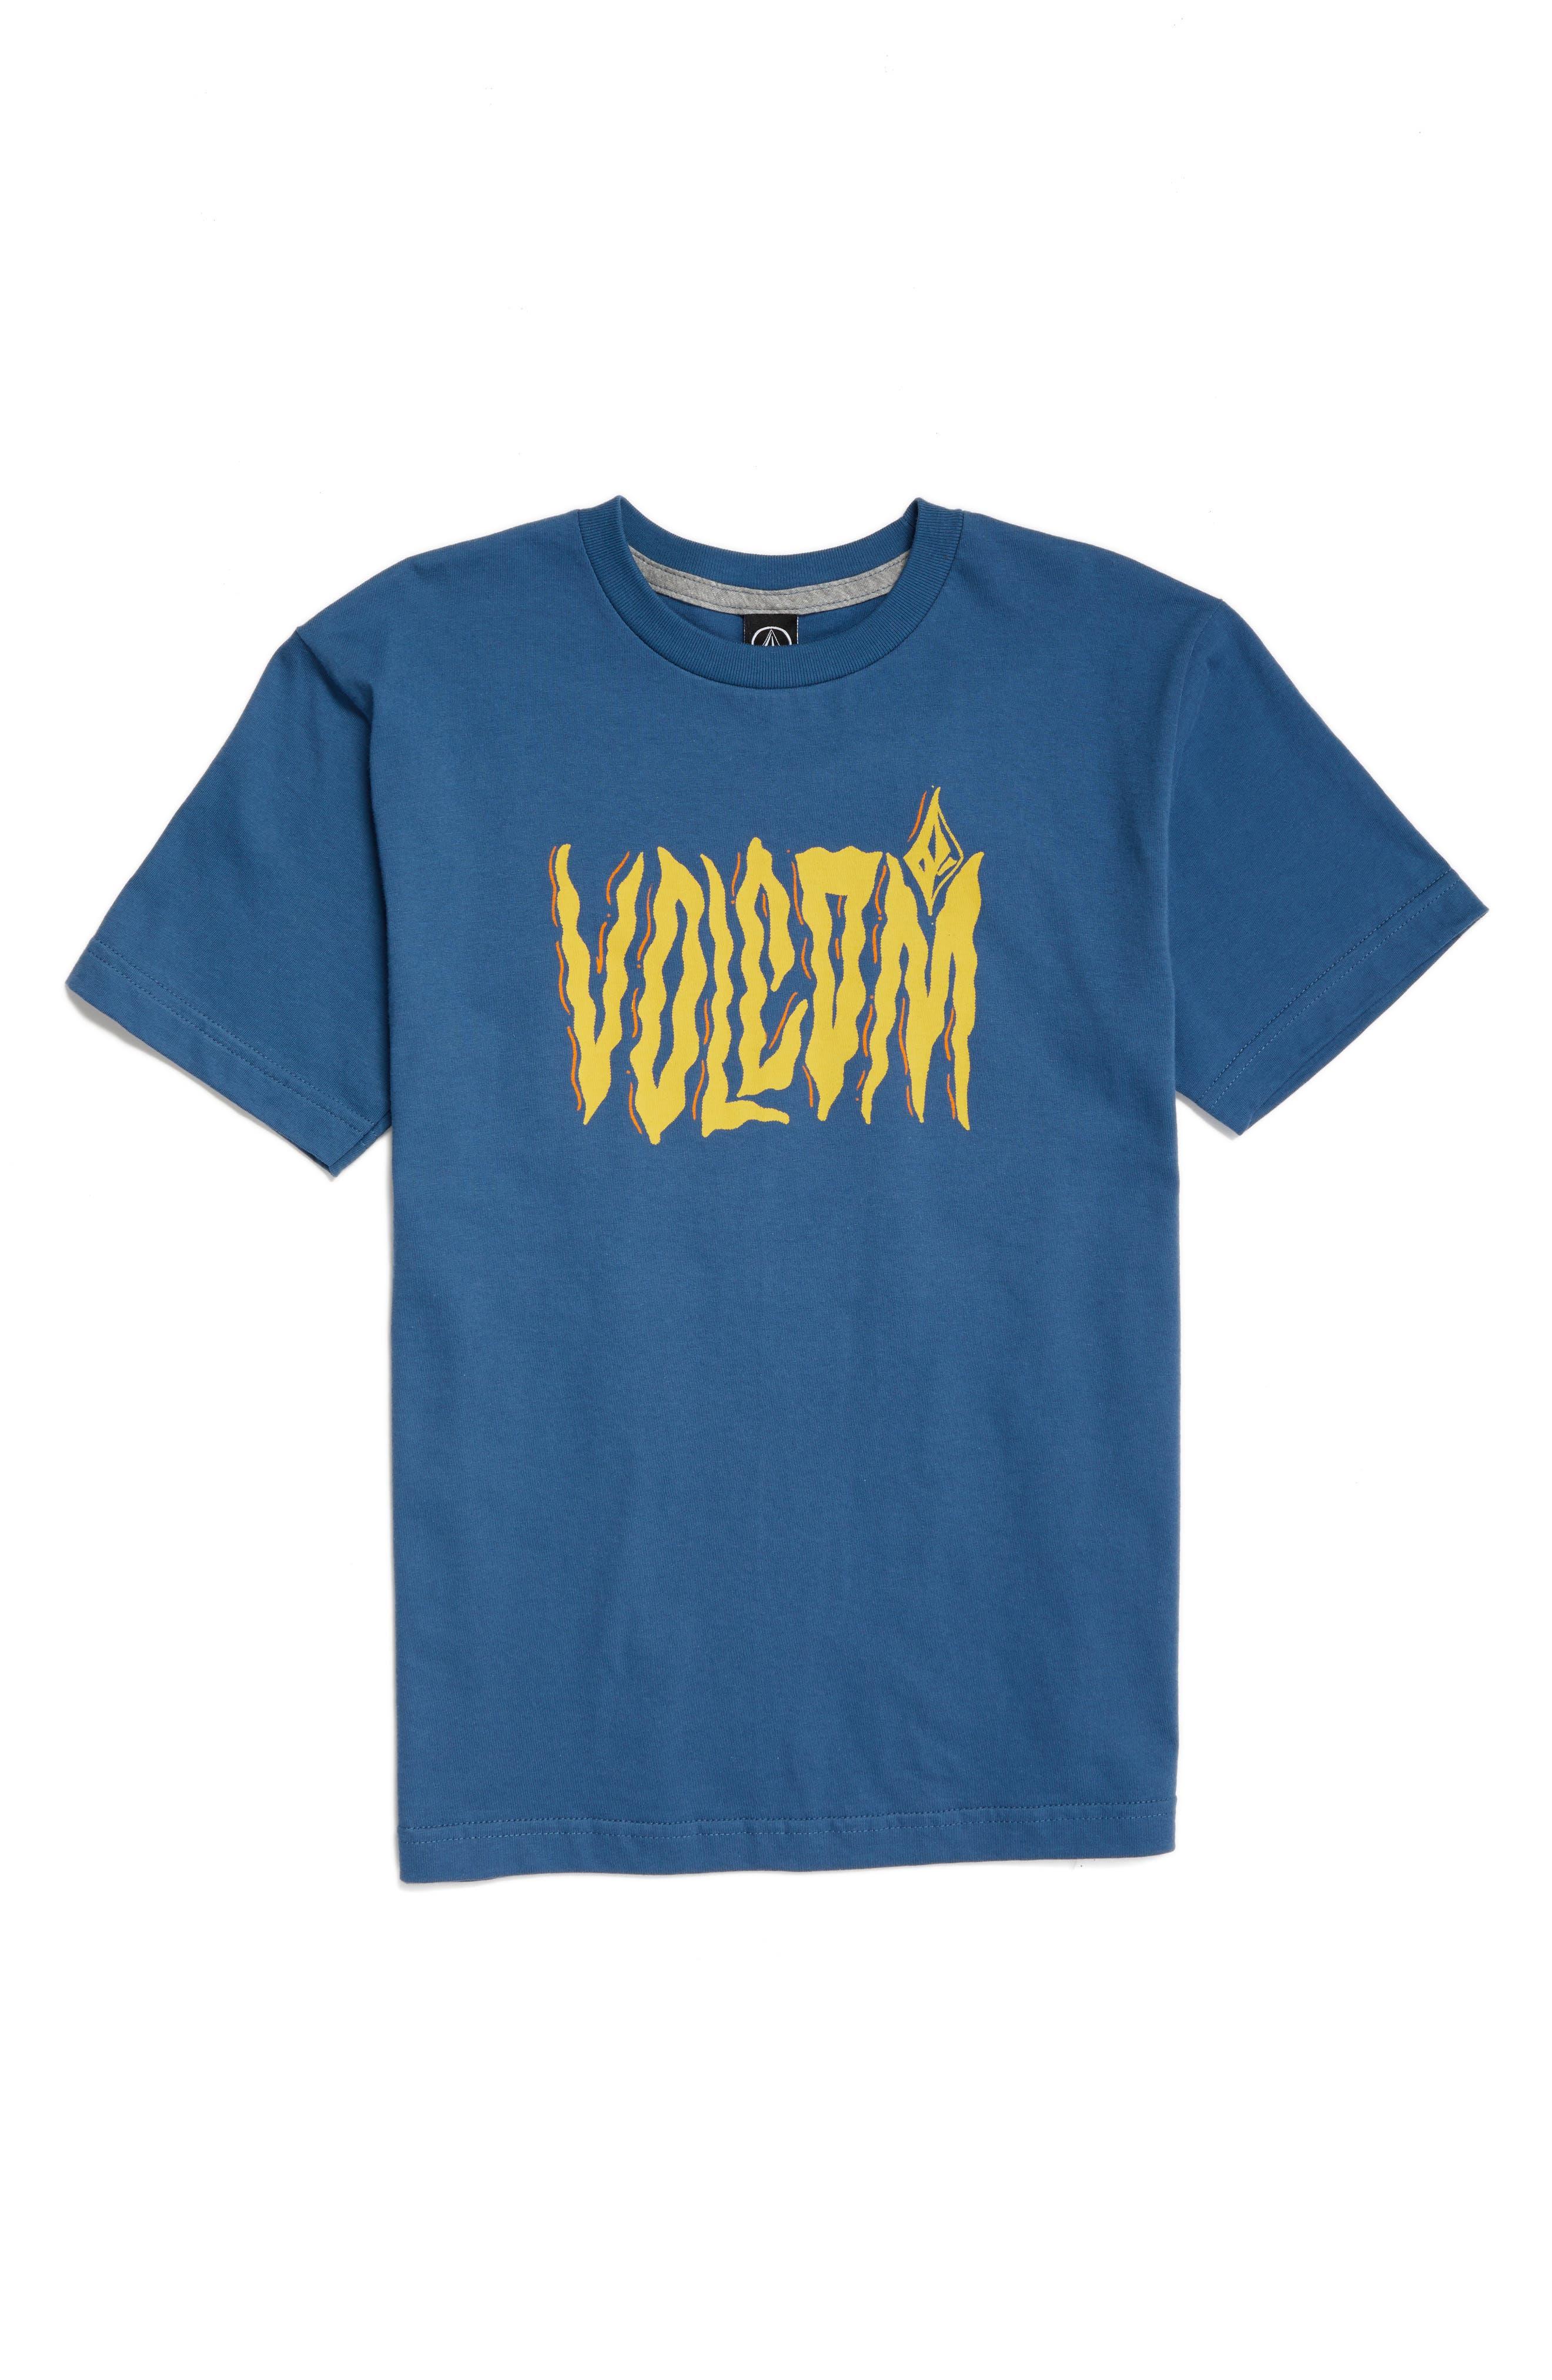 Main Image - Volcom Steam T-Shirt (Toddler Boys, Little Boys & Big Boys)